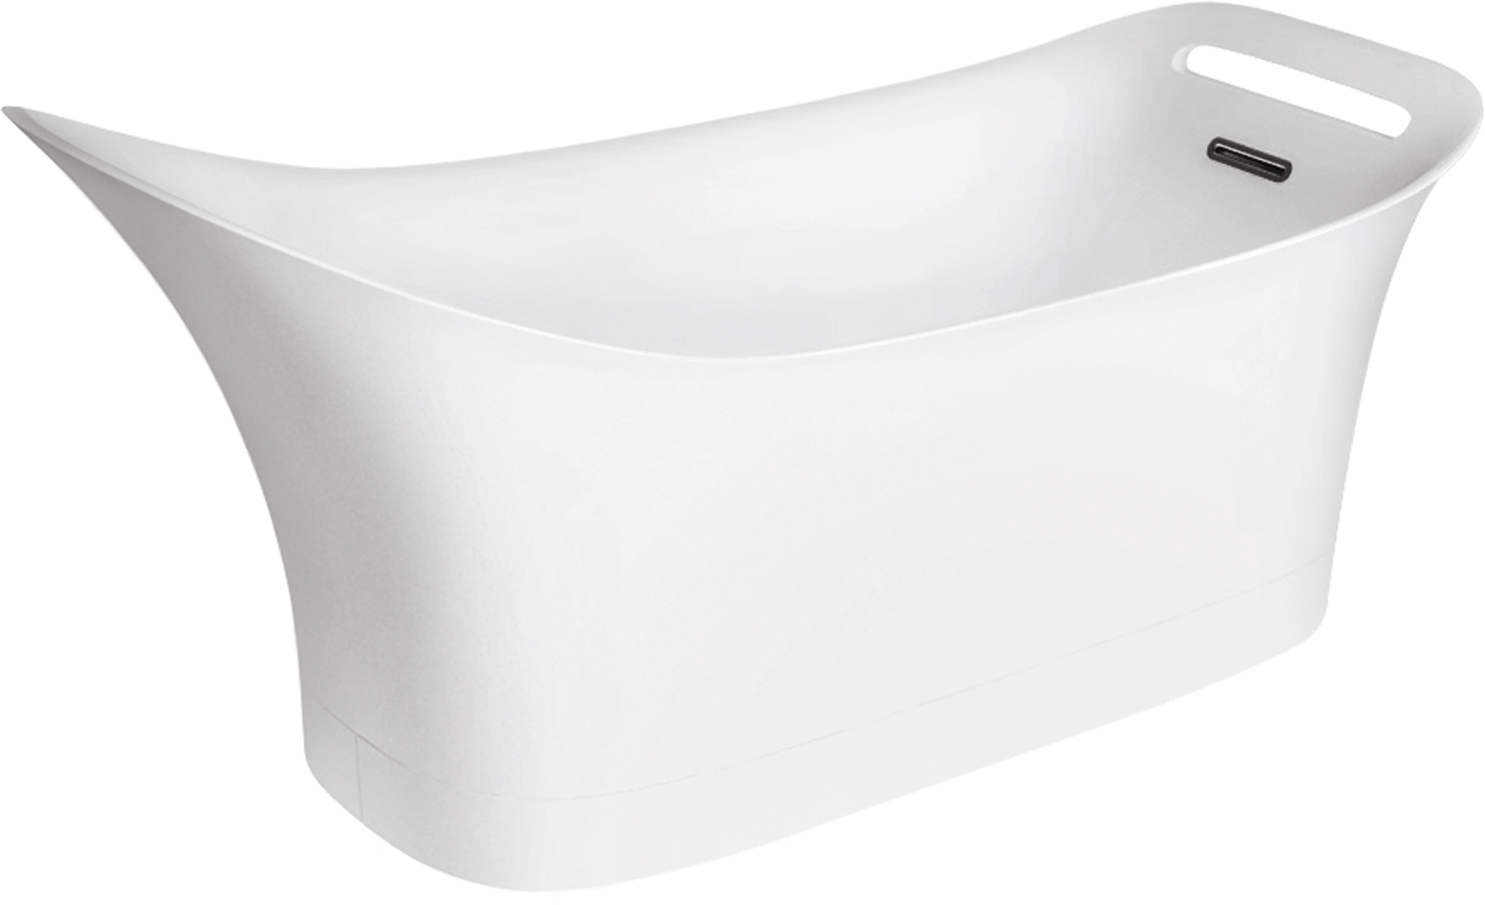 Axor AXOR Urquiola Freestanding Tub